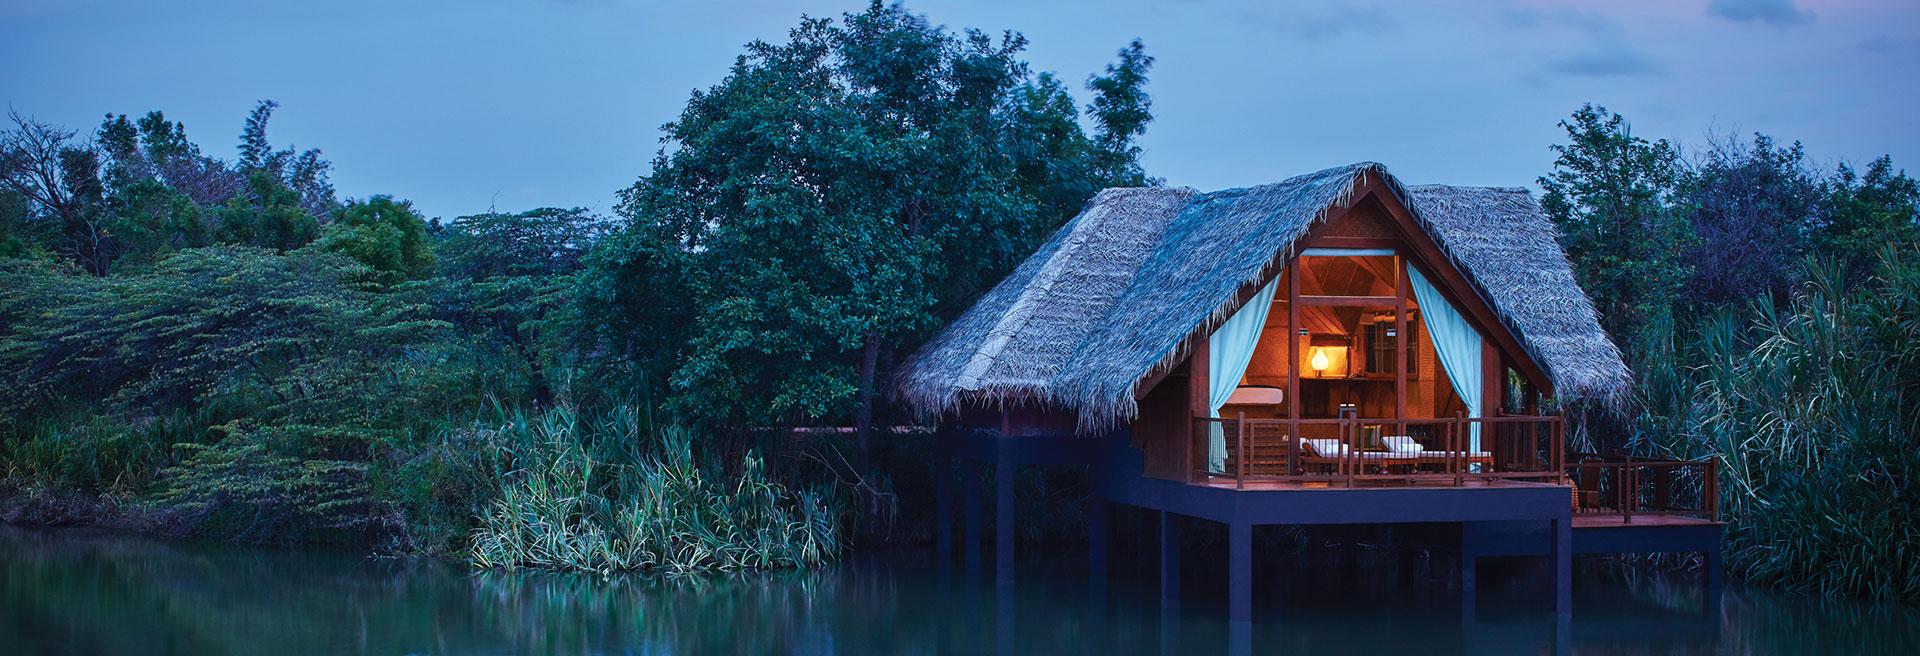 Waterdwelling Accommodation Exterior